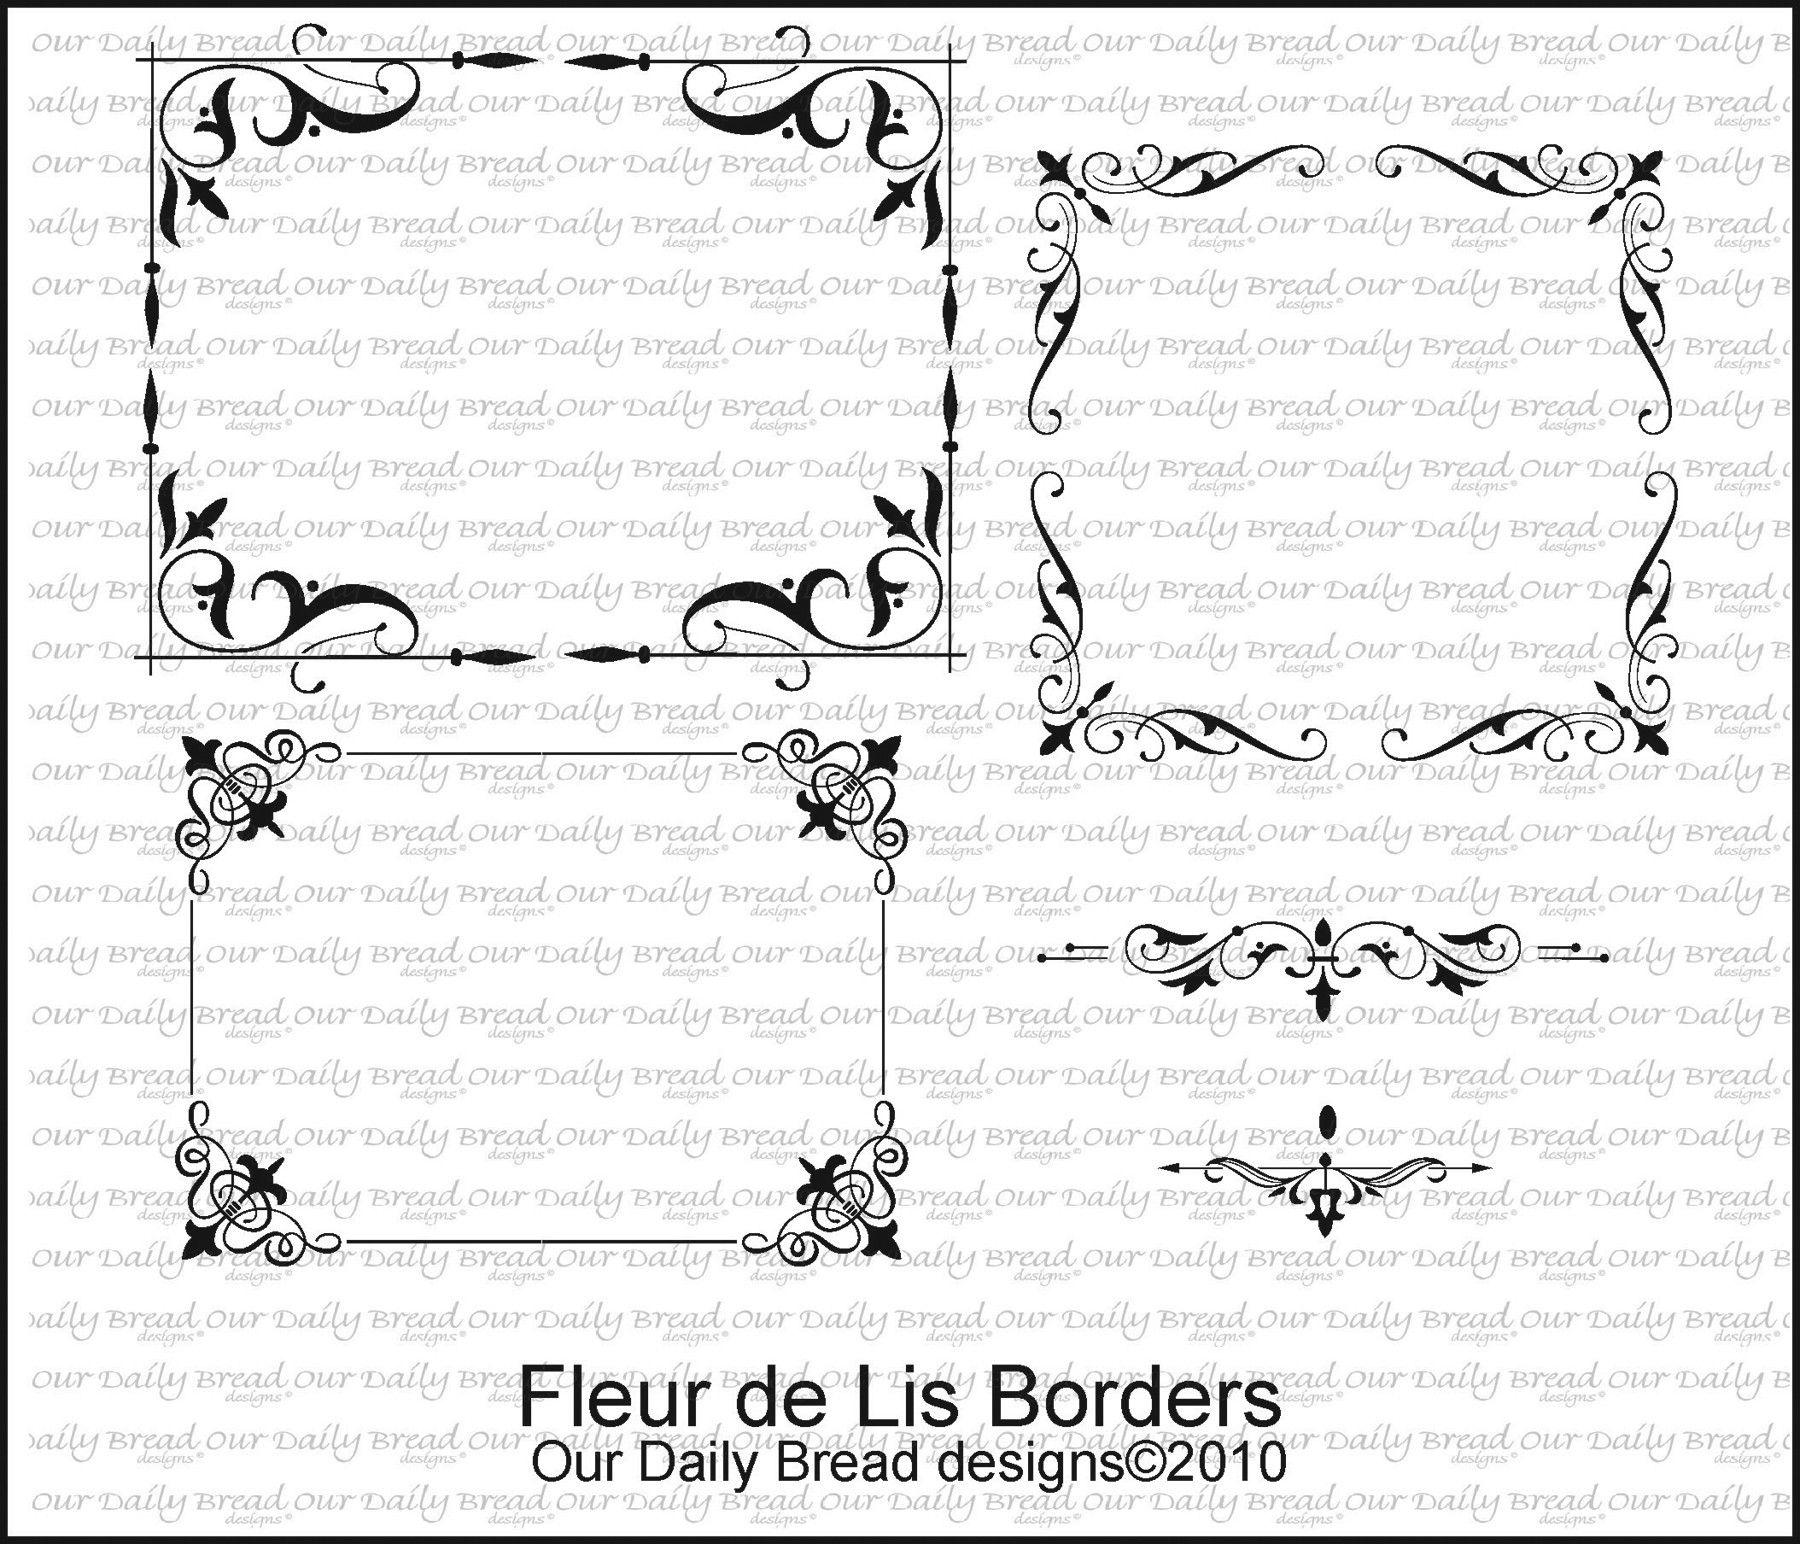 Fleur de lis borders chalkboard art design stamps